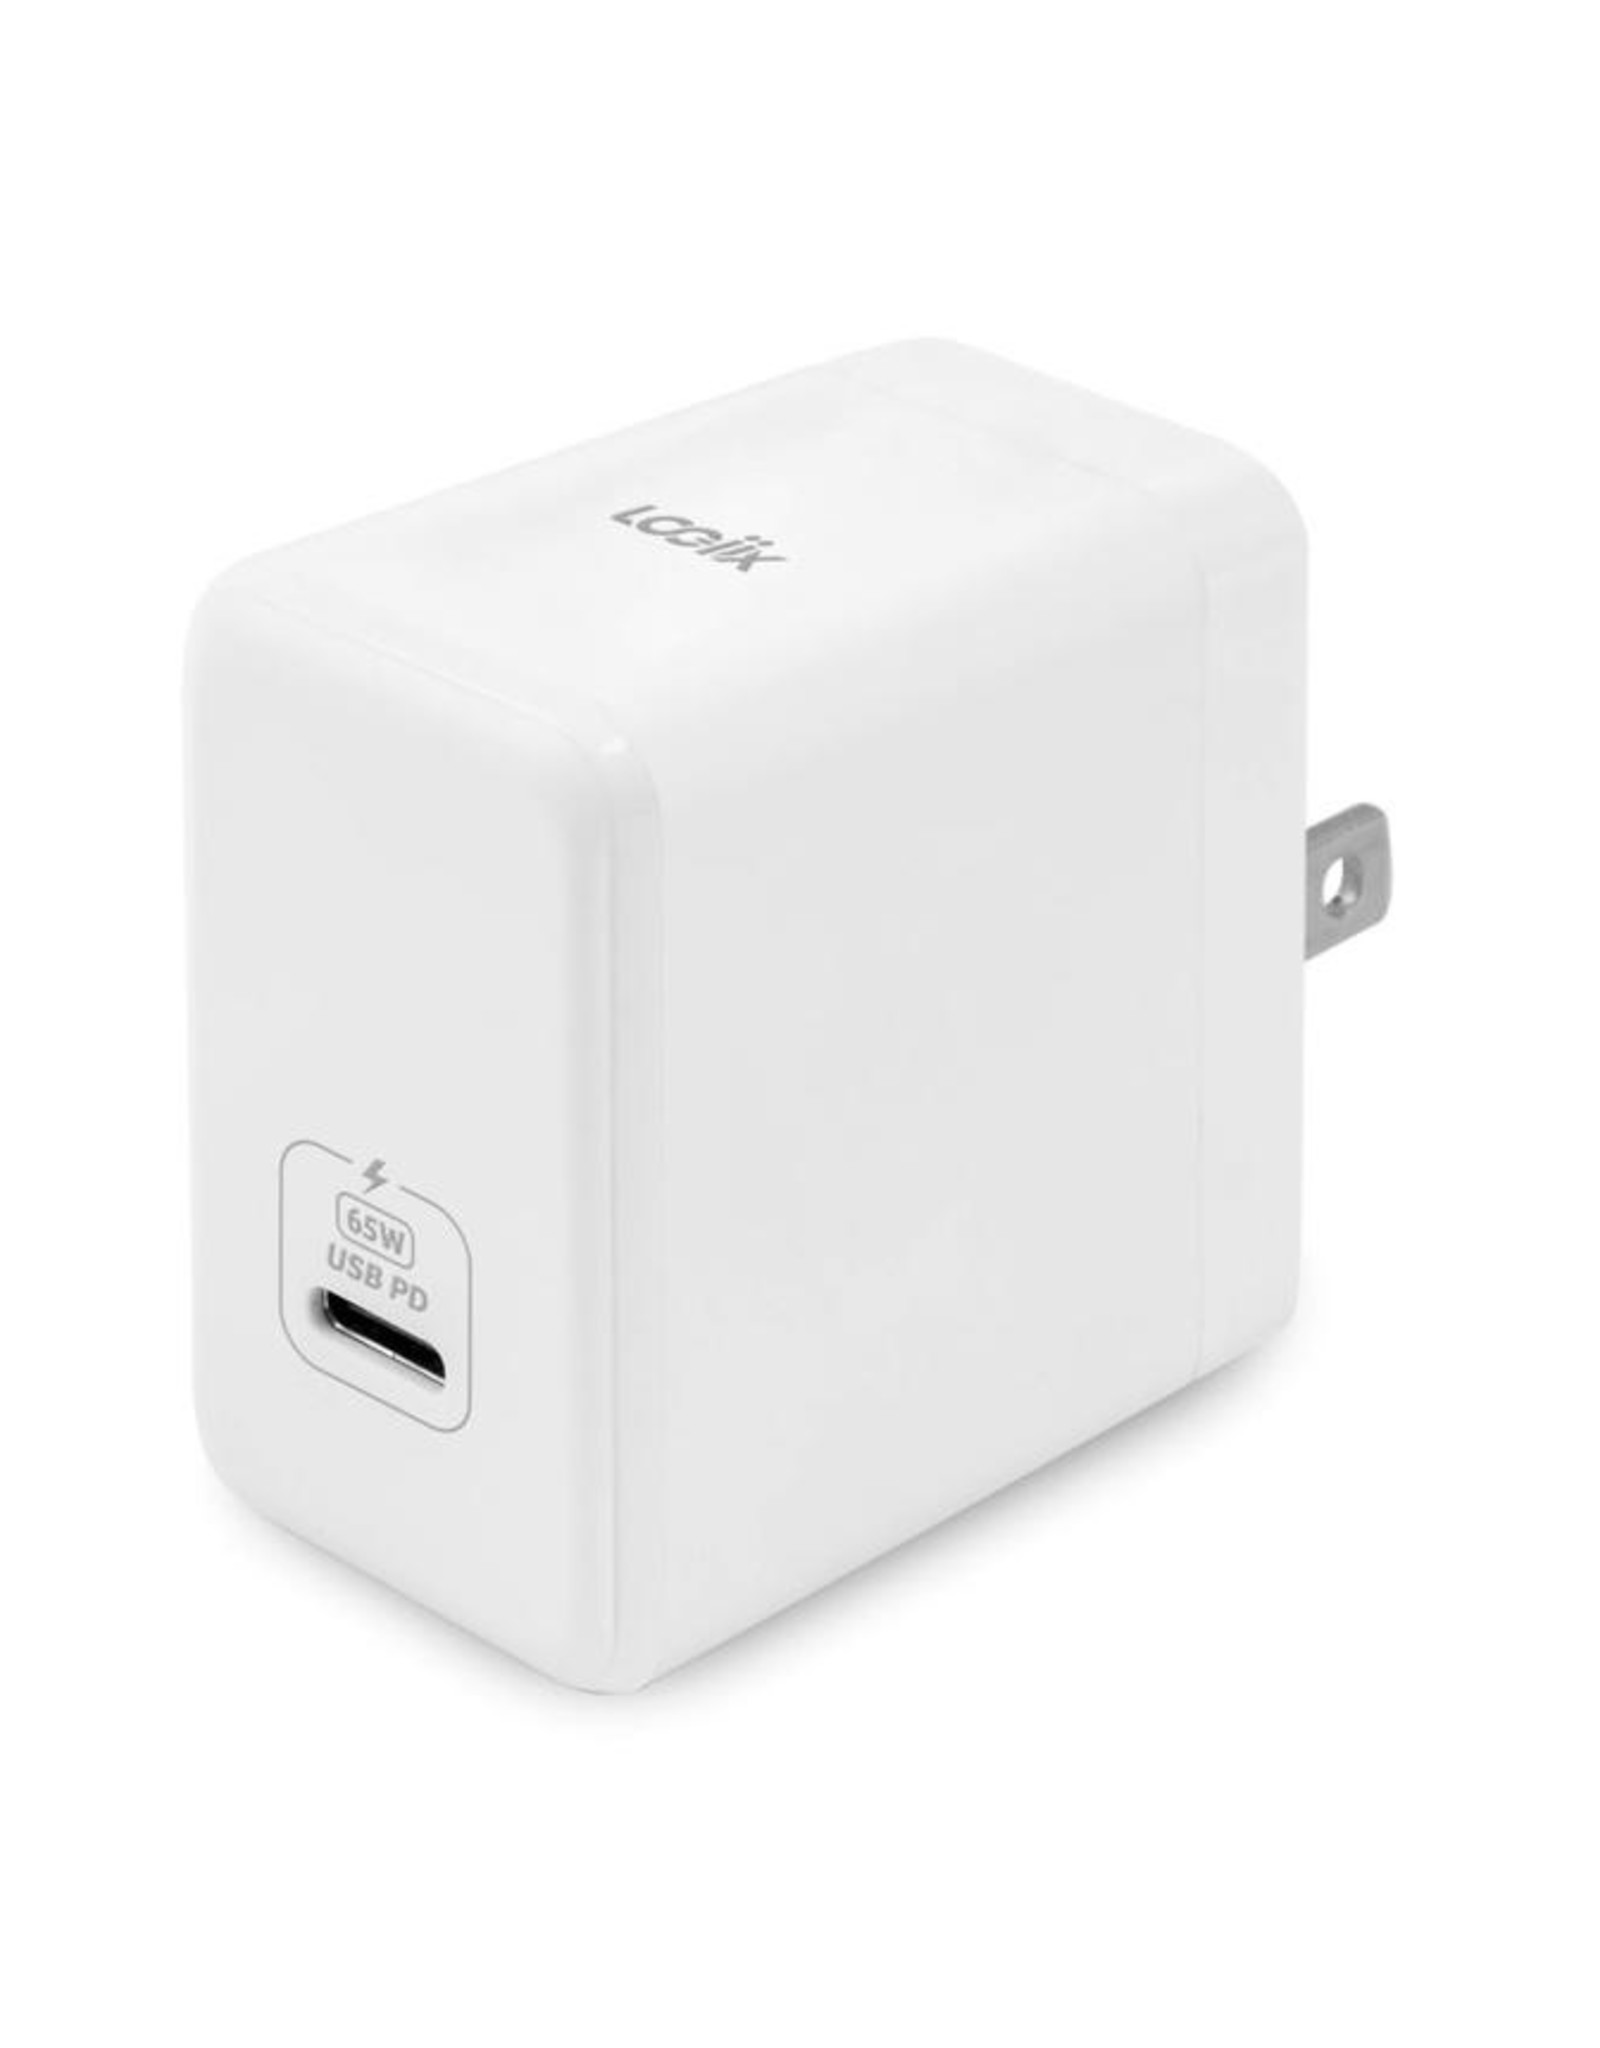 Logiix LOGiiX Power Plus 65 USB PD Wall Charger - White LGX-13112